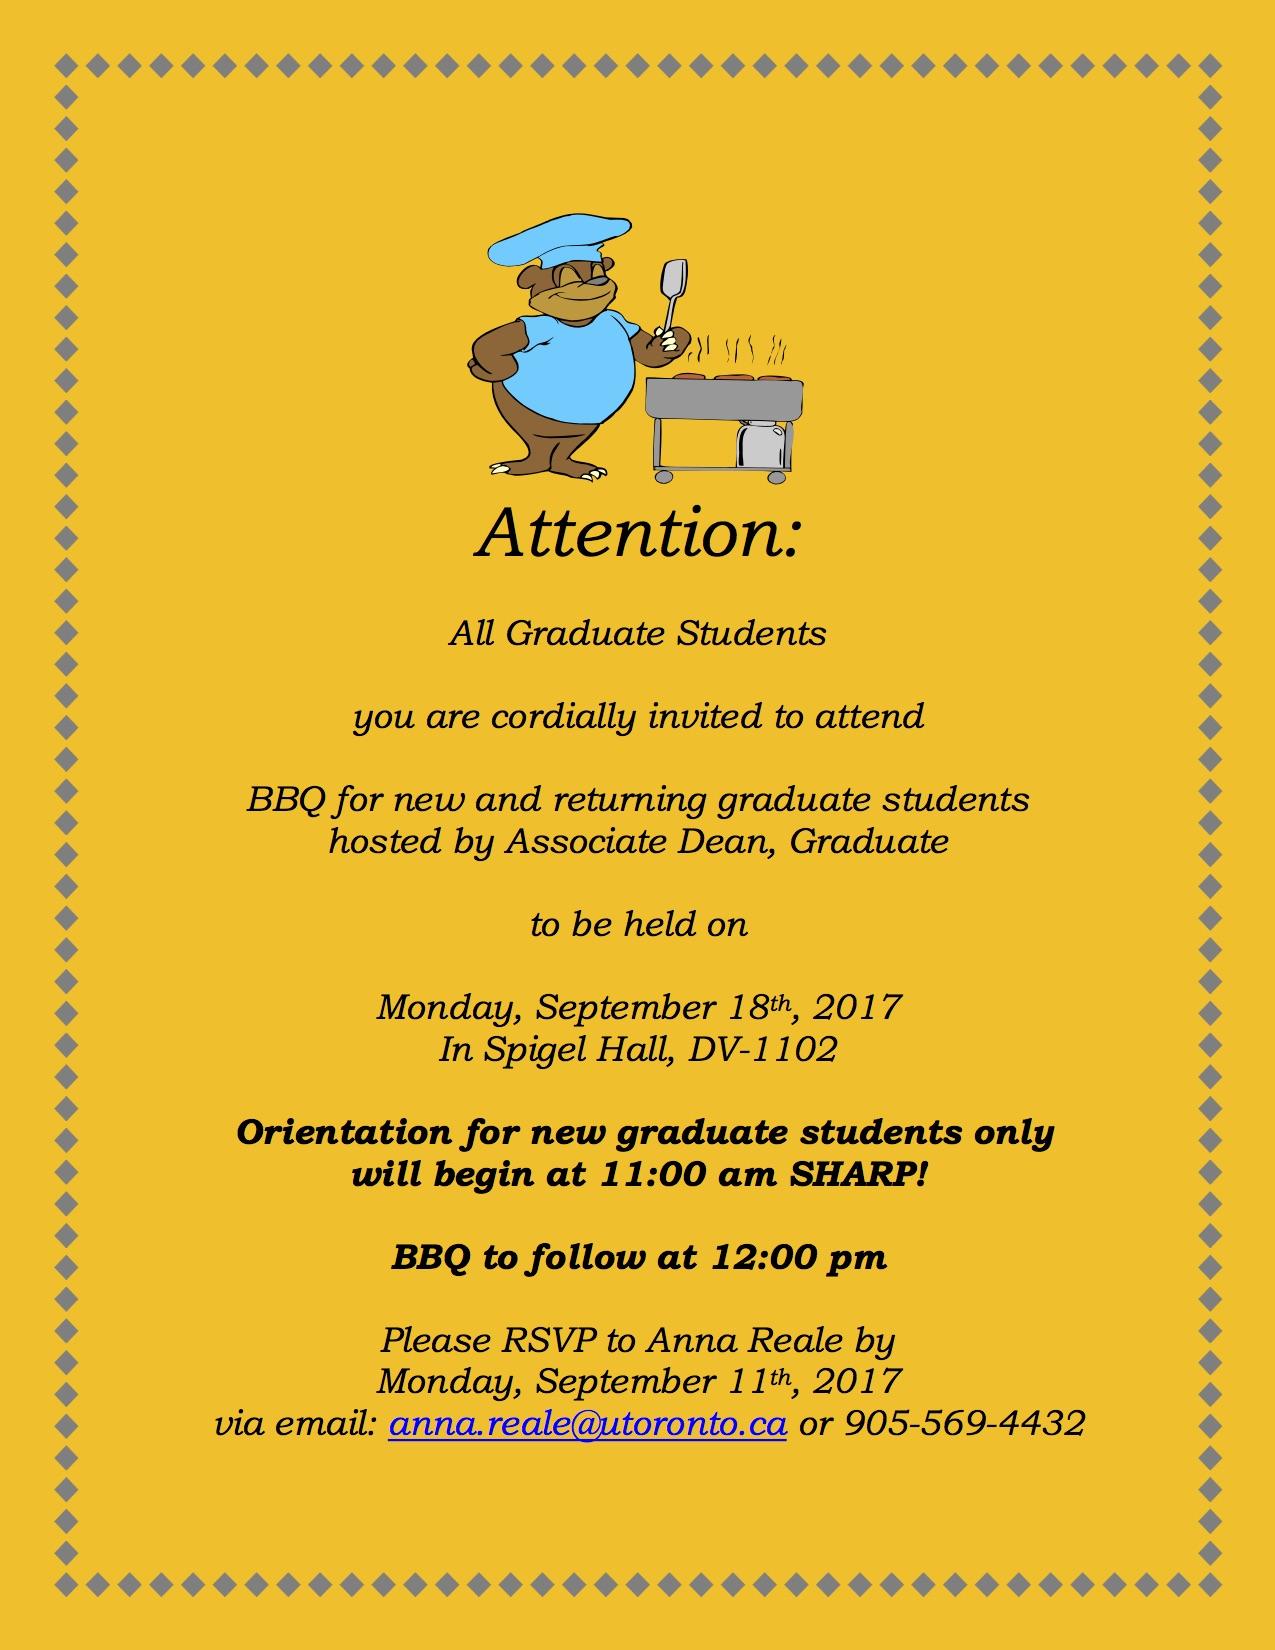 Orientation & BBQ - Sept. 18, 2017